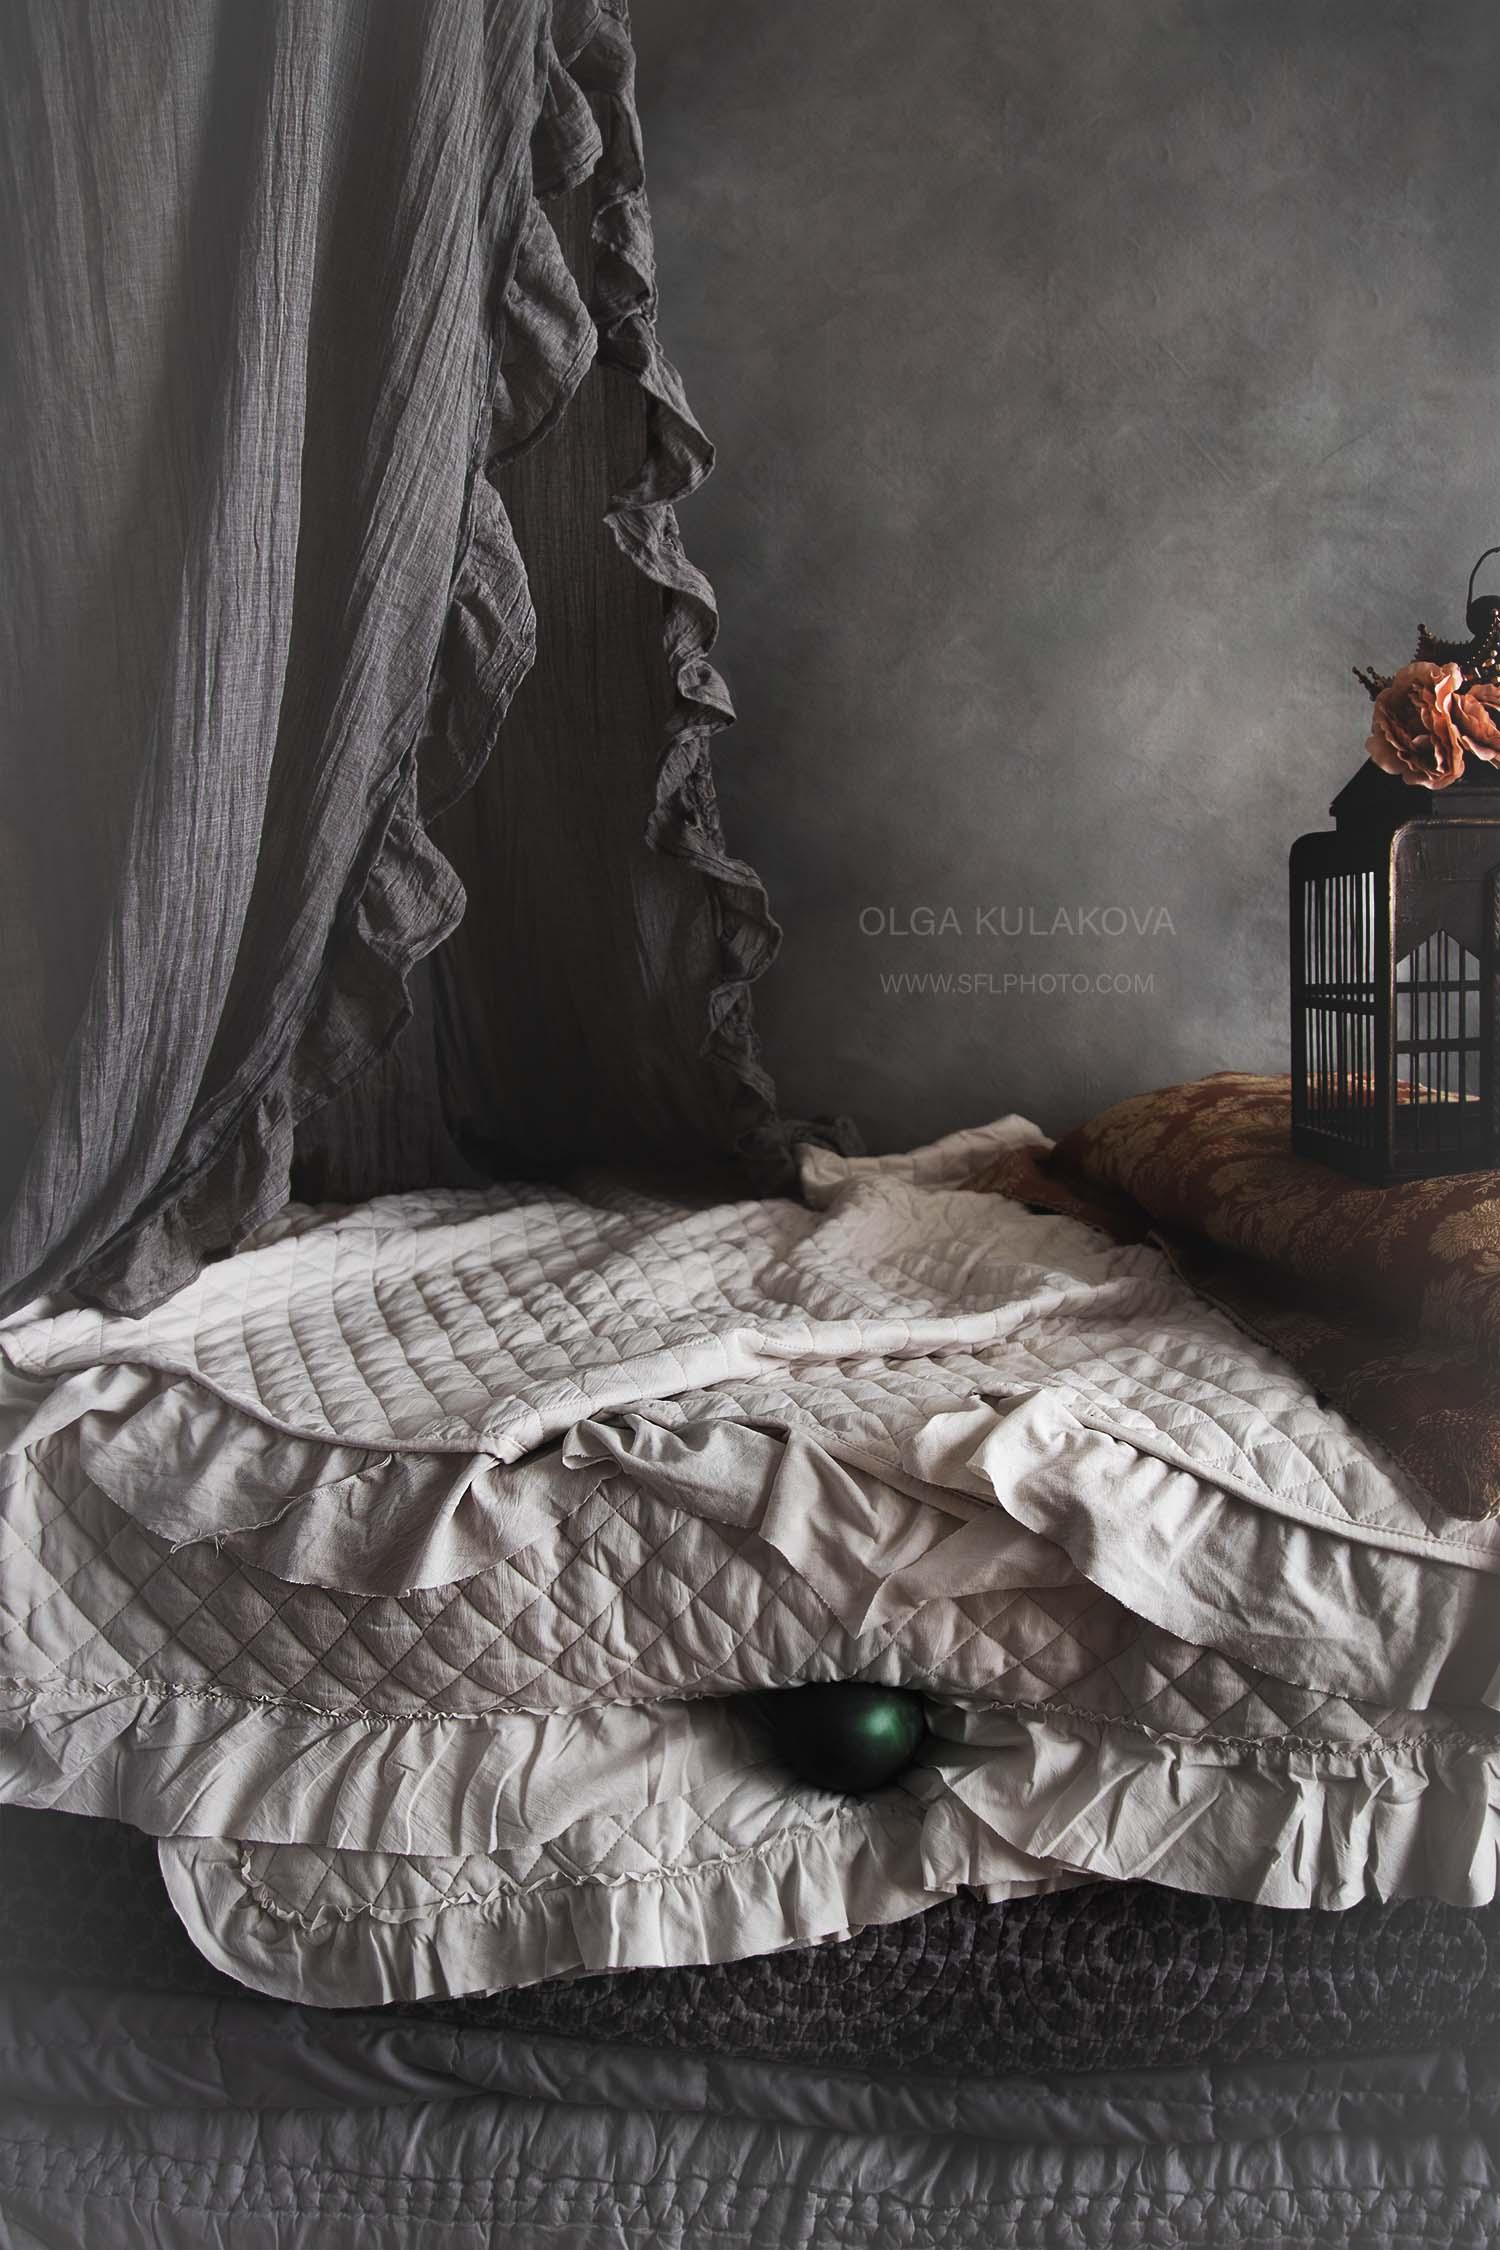 """The Princess On The Pea"" Project – Most Authentic Setup By Olga Kulakova"